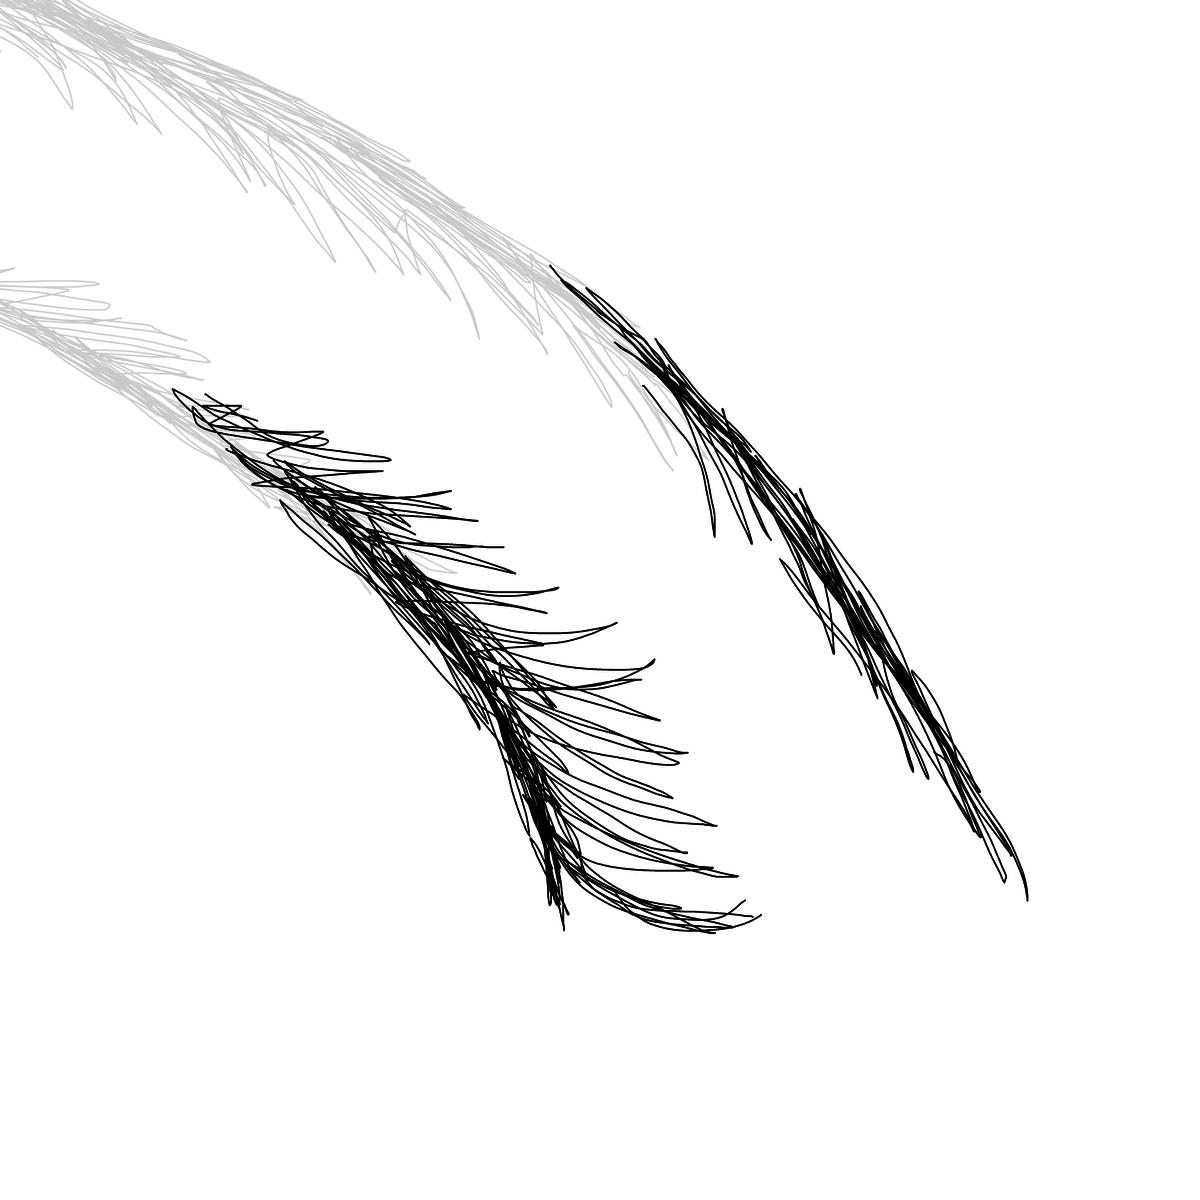 BAAAM drawing#18266 lat:-23.5473251342773440lng: -46.6349105834960940